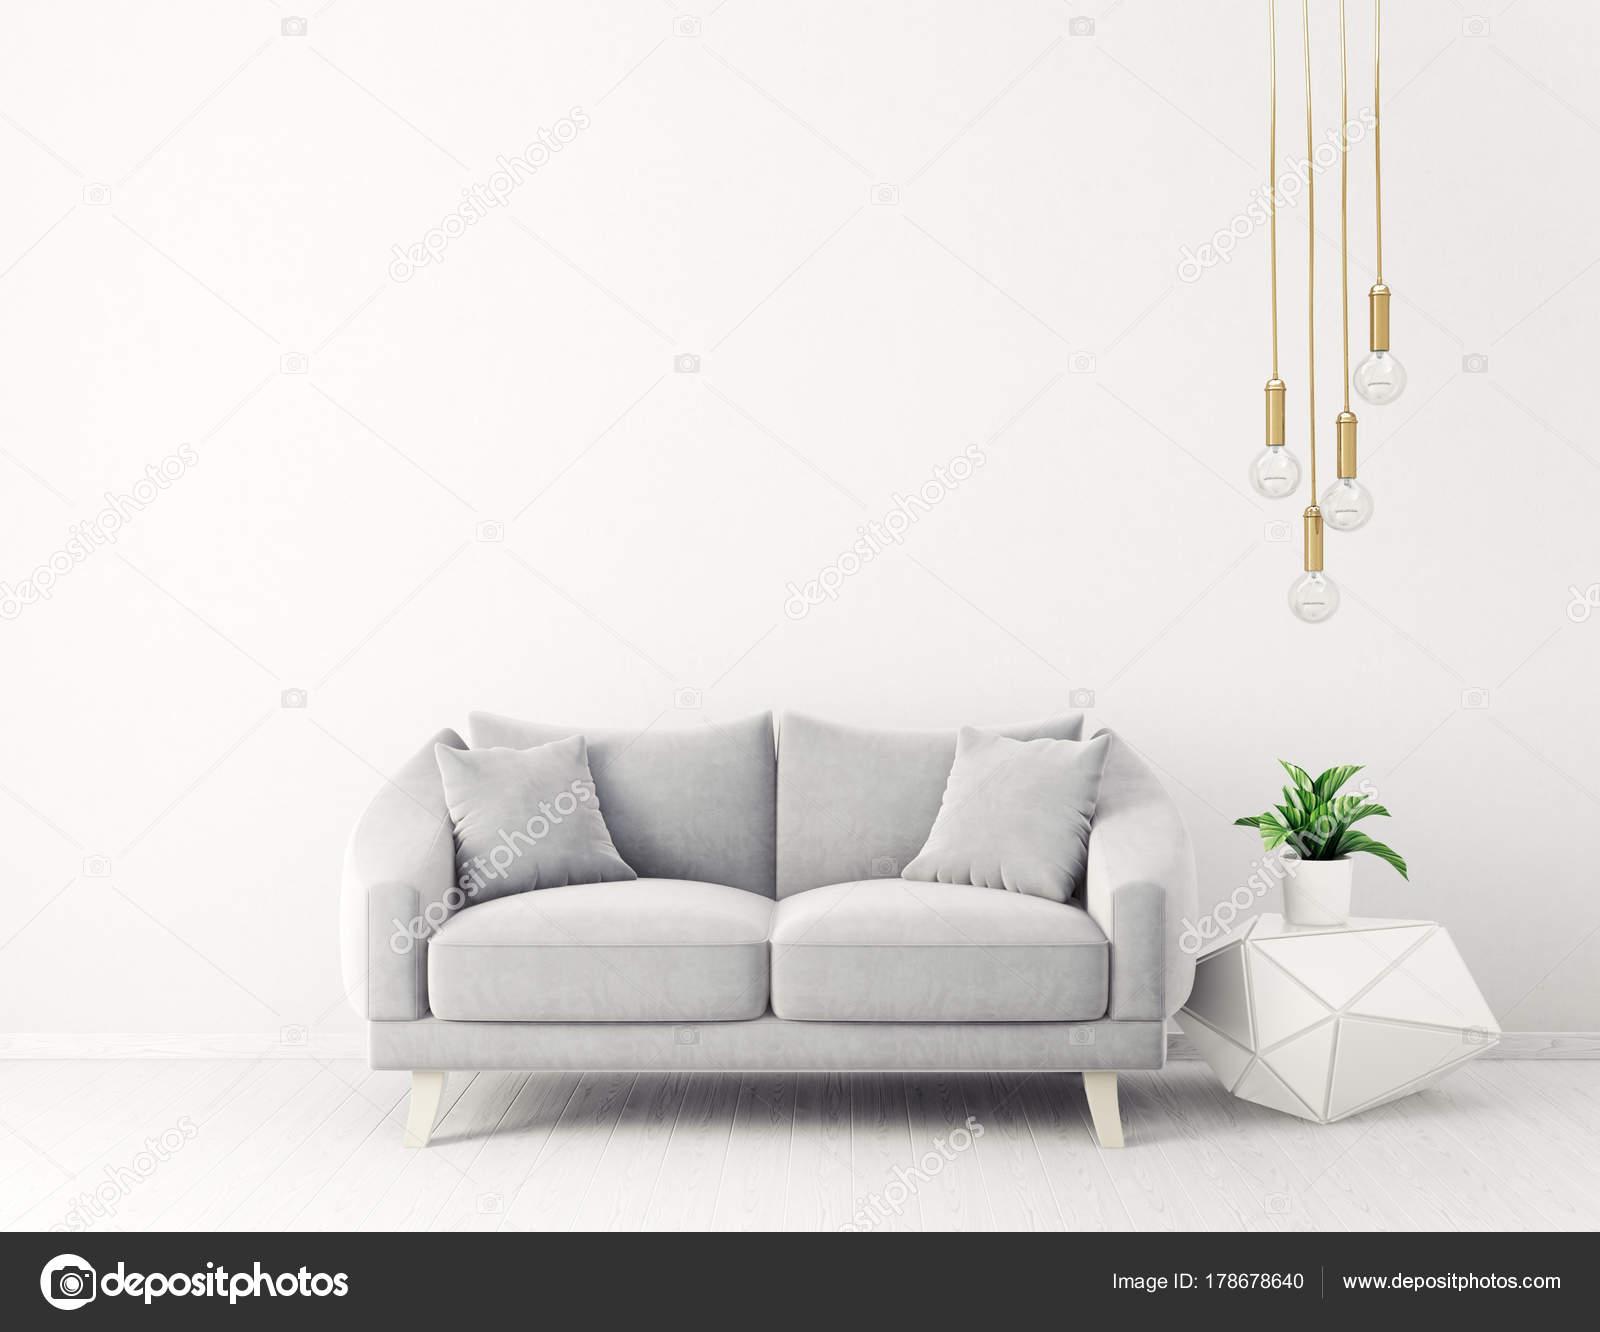 Design Woonkamer Lampen : Moderne woonkamer met sofa lampen scandinavisch interieur design